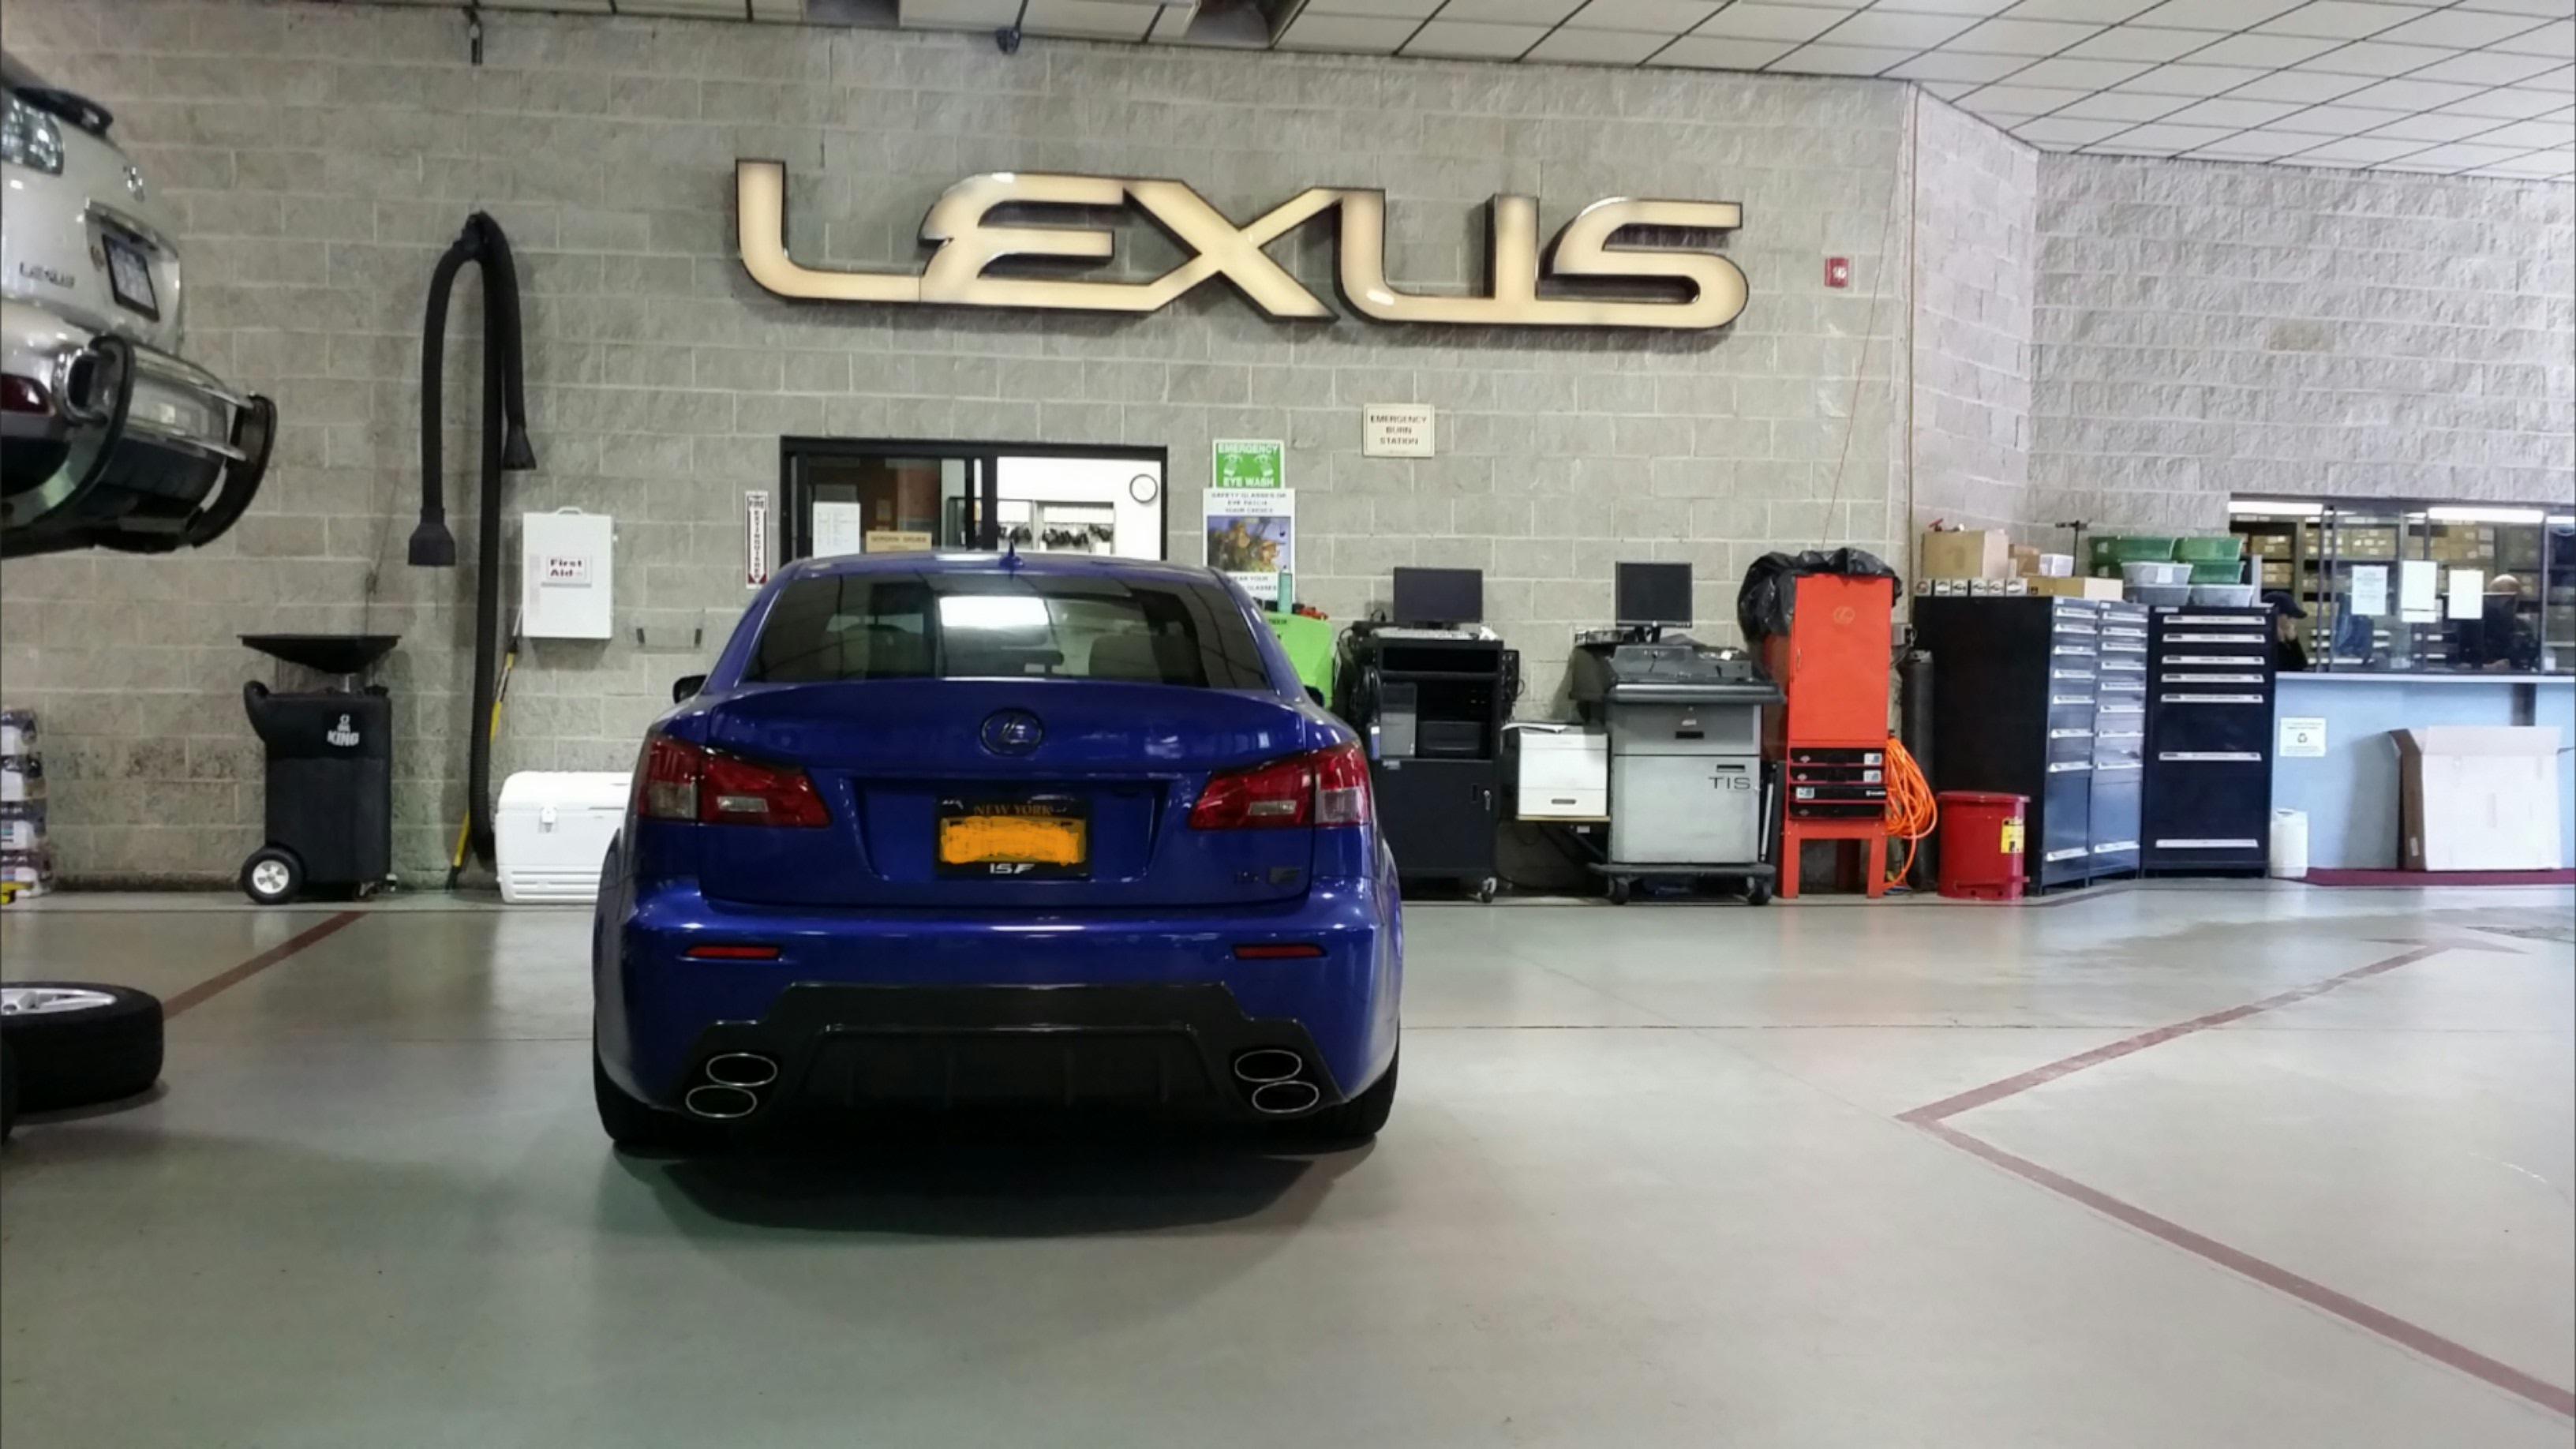 Dealership declining to install aftermarket parts ClubLexus